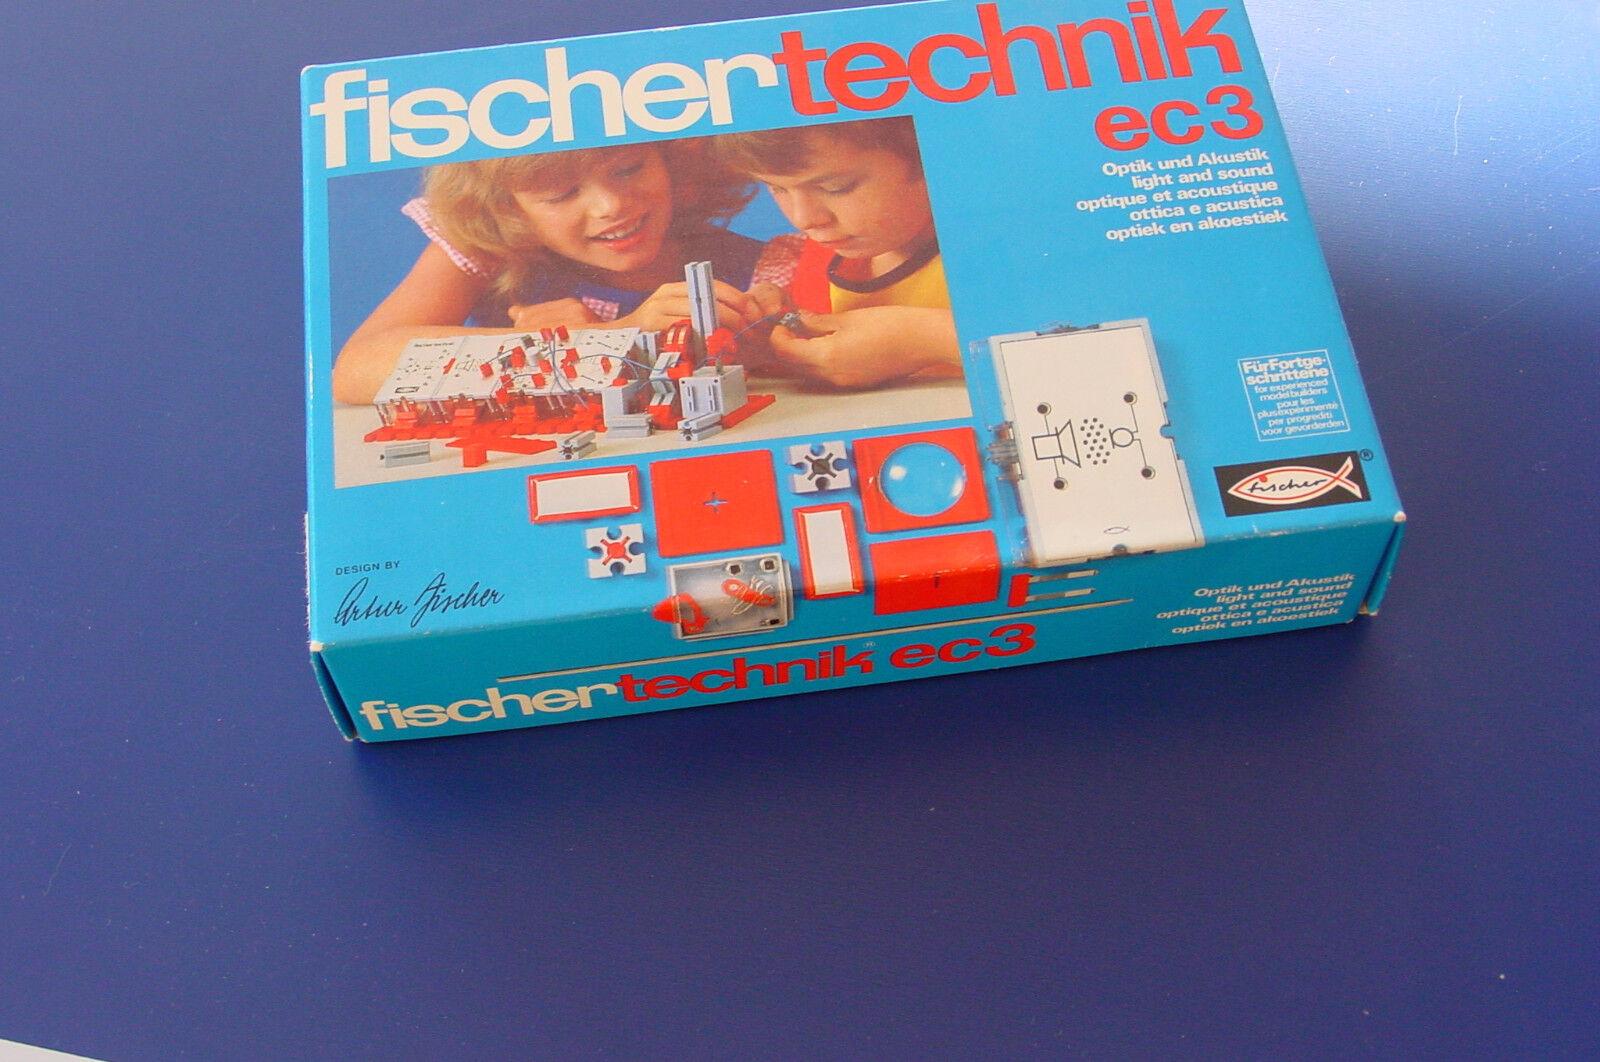 Fischertechnik - Elektronik ec3 -- Unbespielt